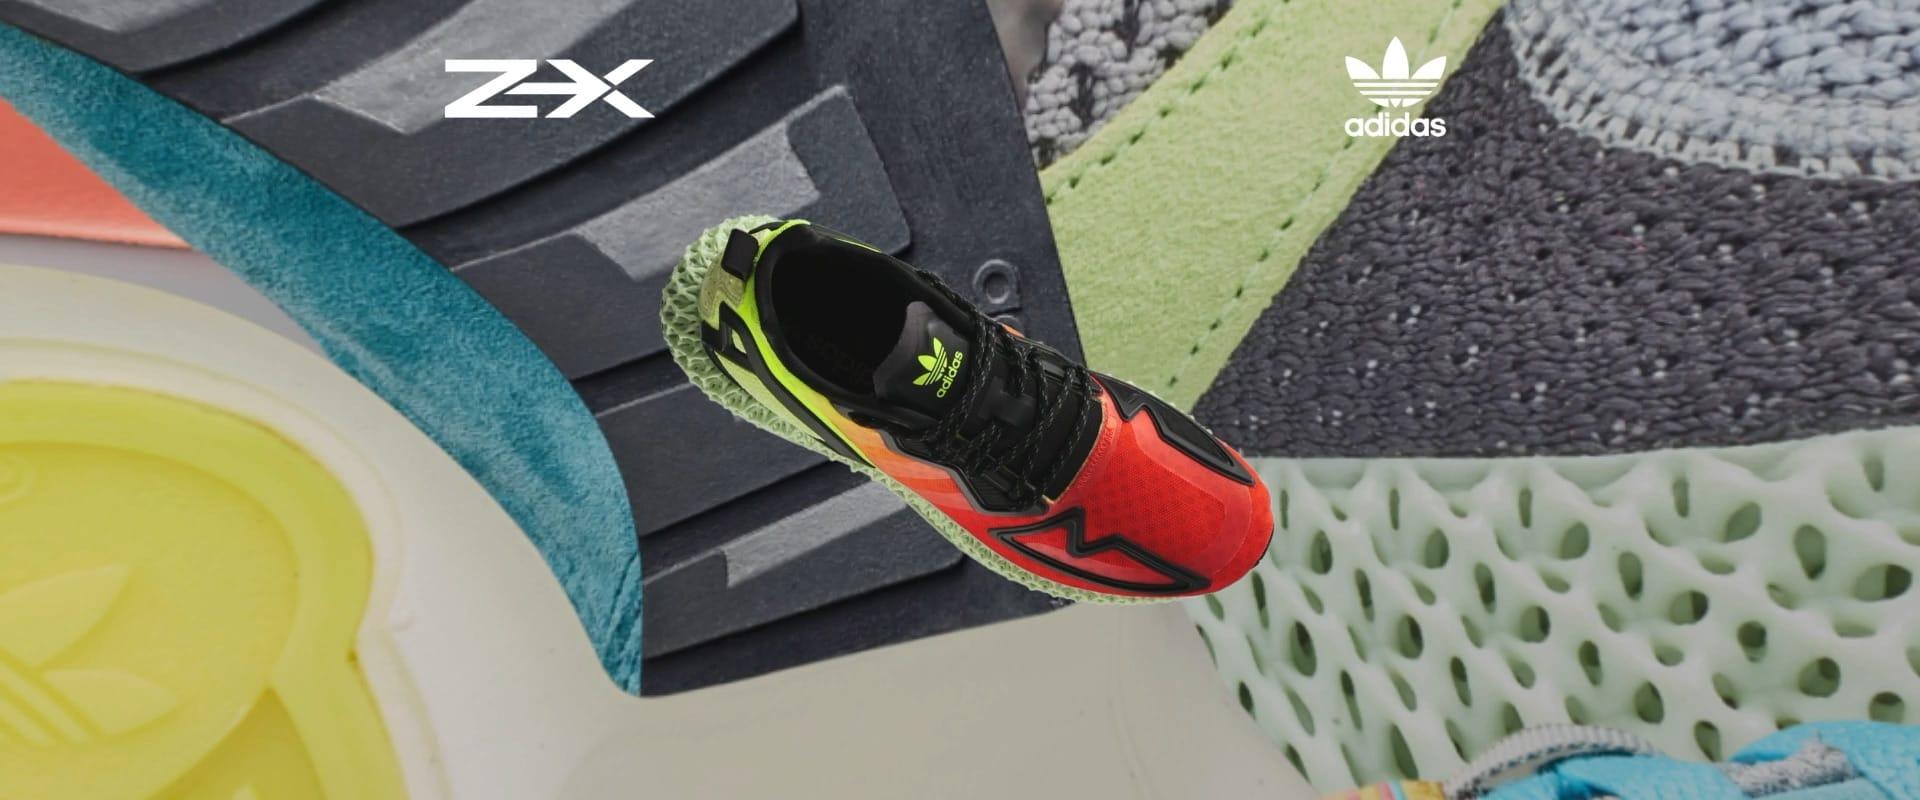 adidas store online